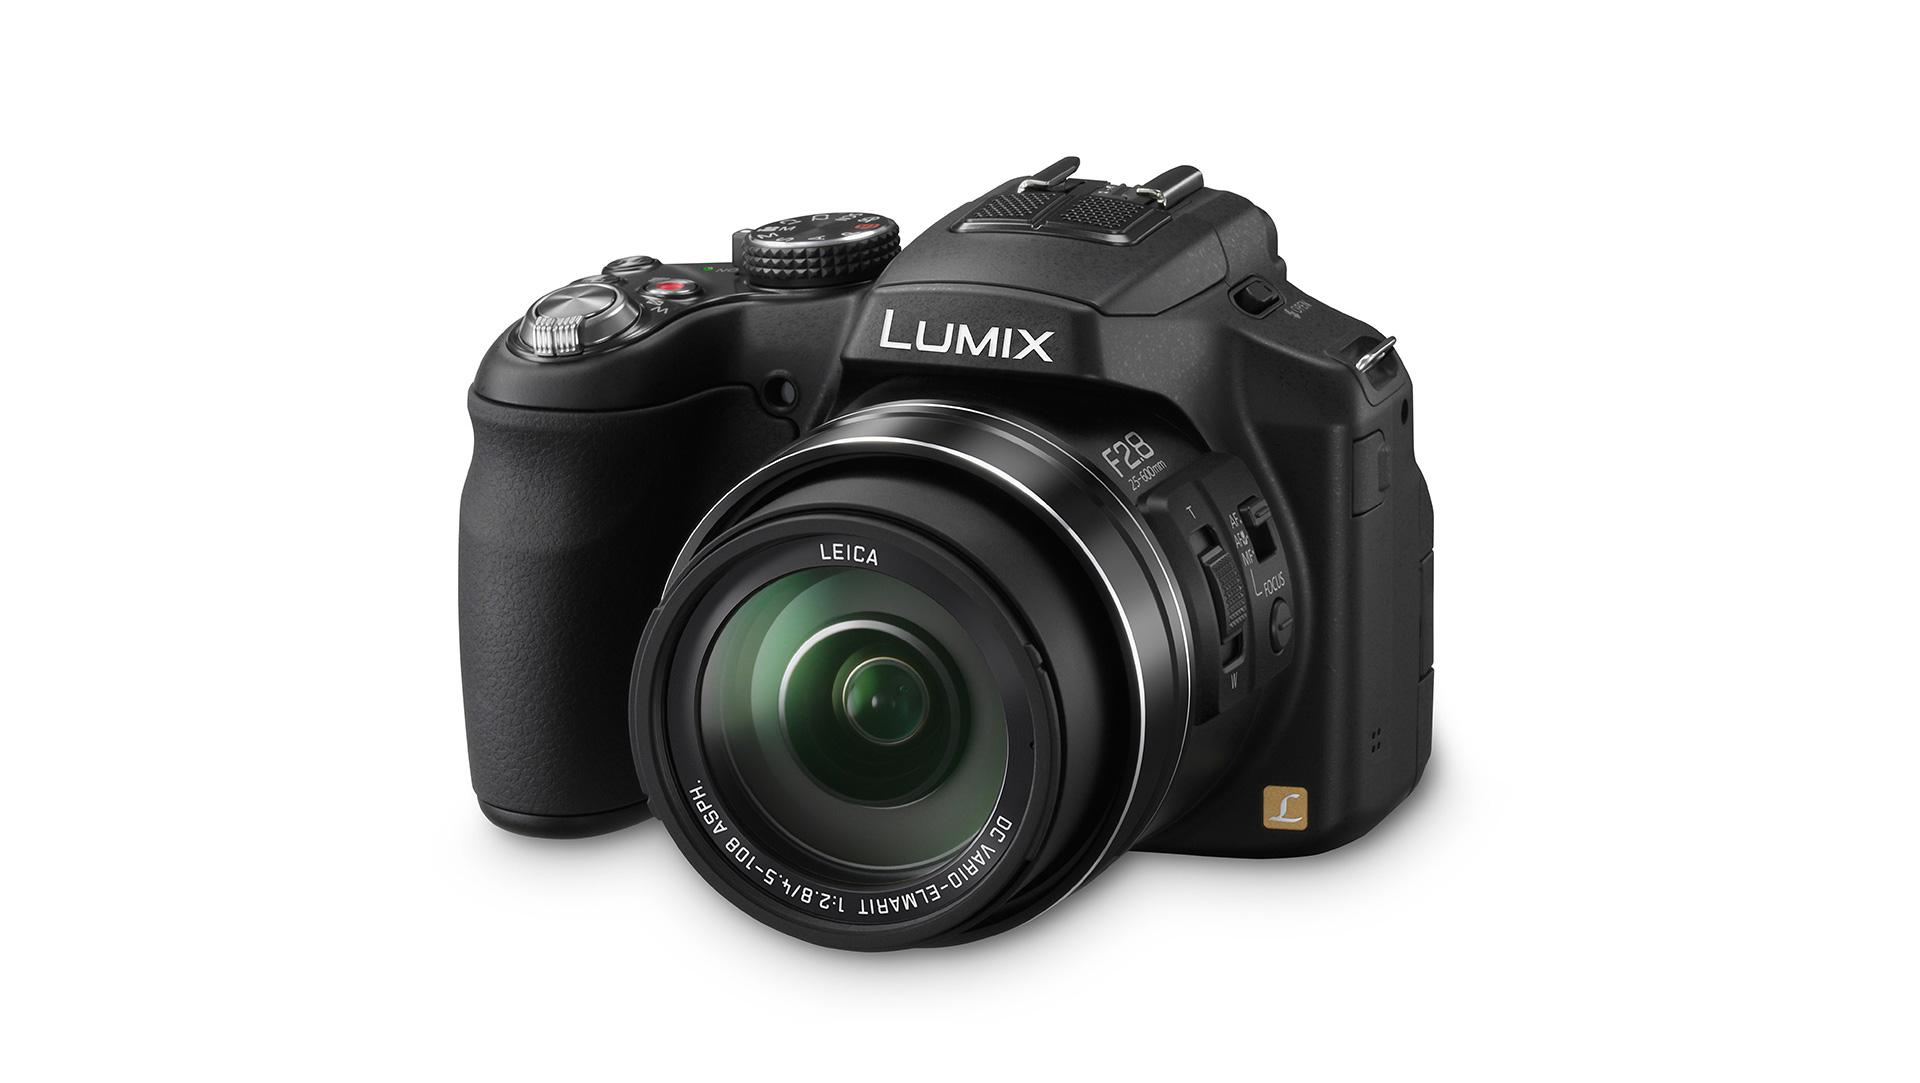 panasonic lumix dmc fz200 digital bridge camera 12 1mp. Black Bedroom Furniture Sets. Home Design Ideas